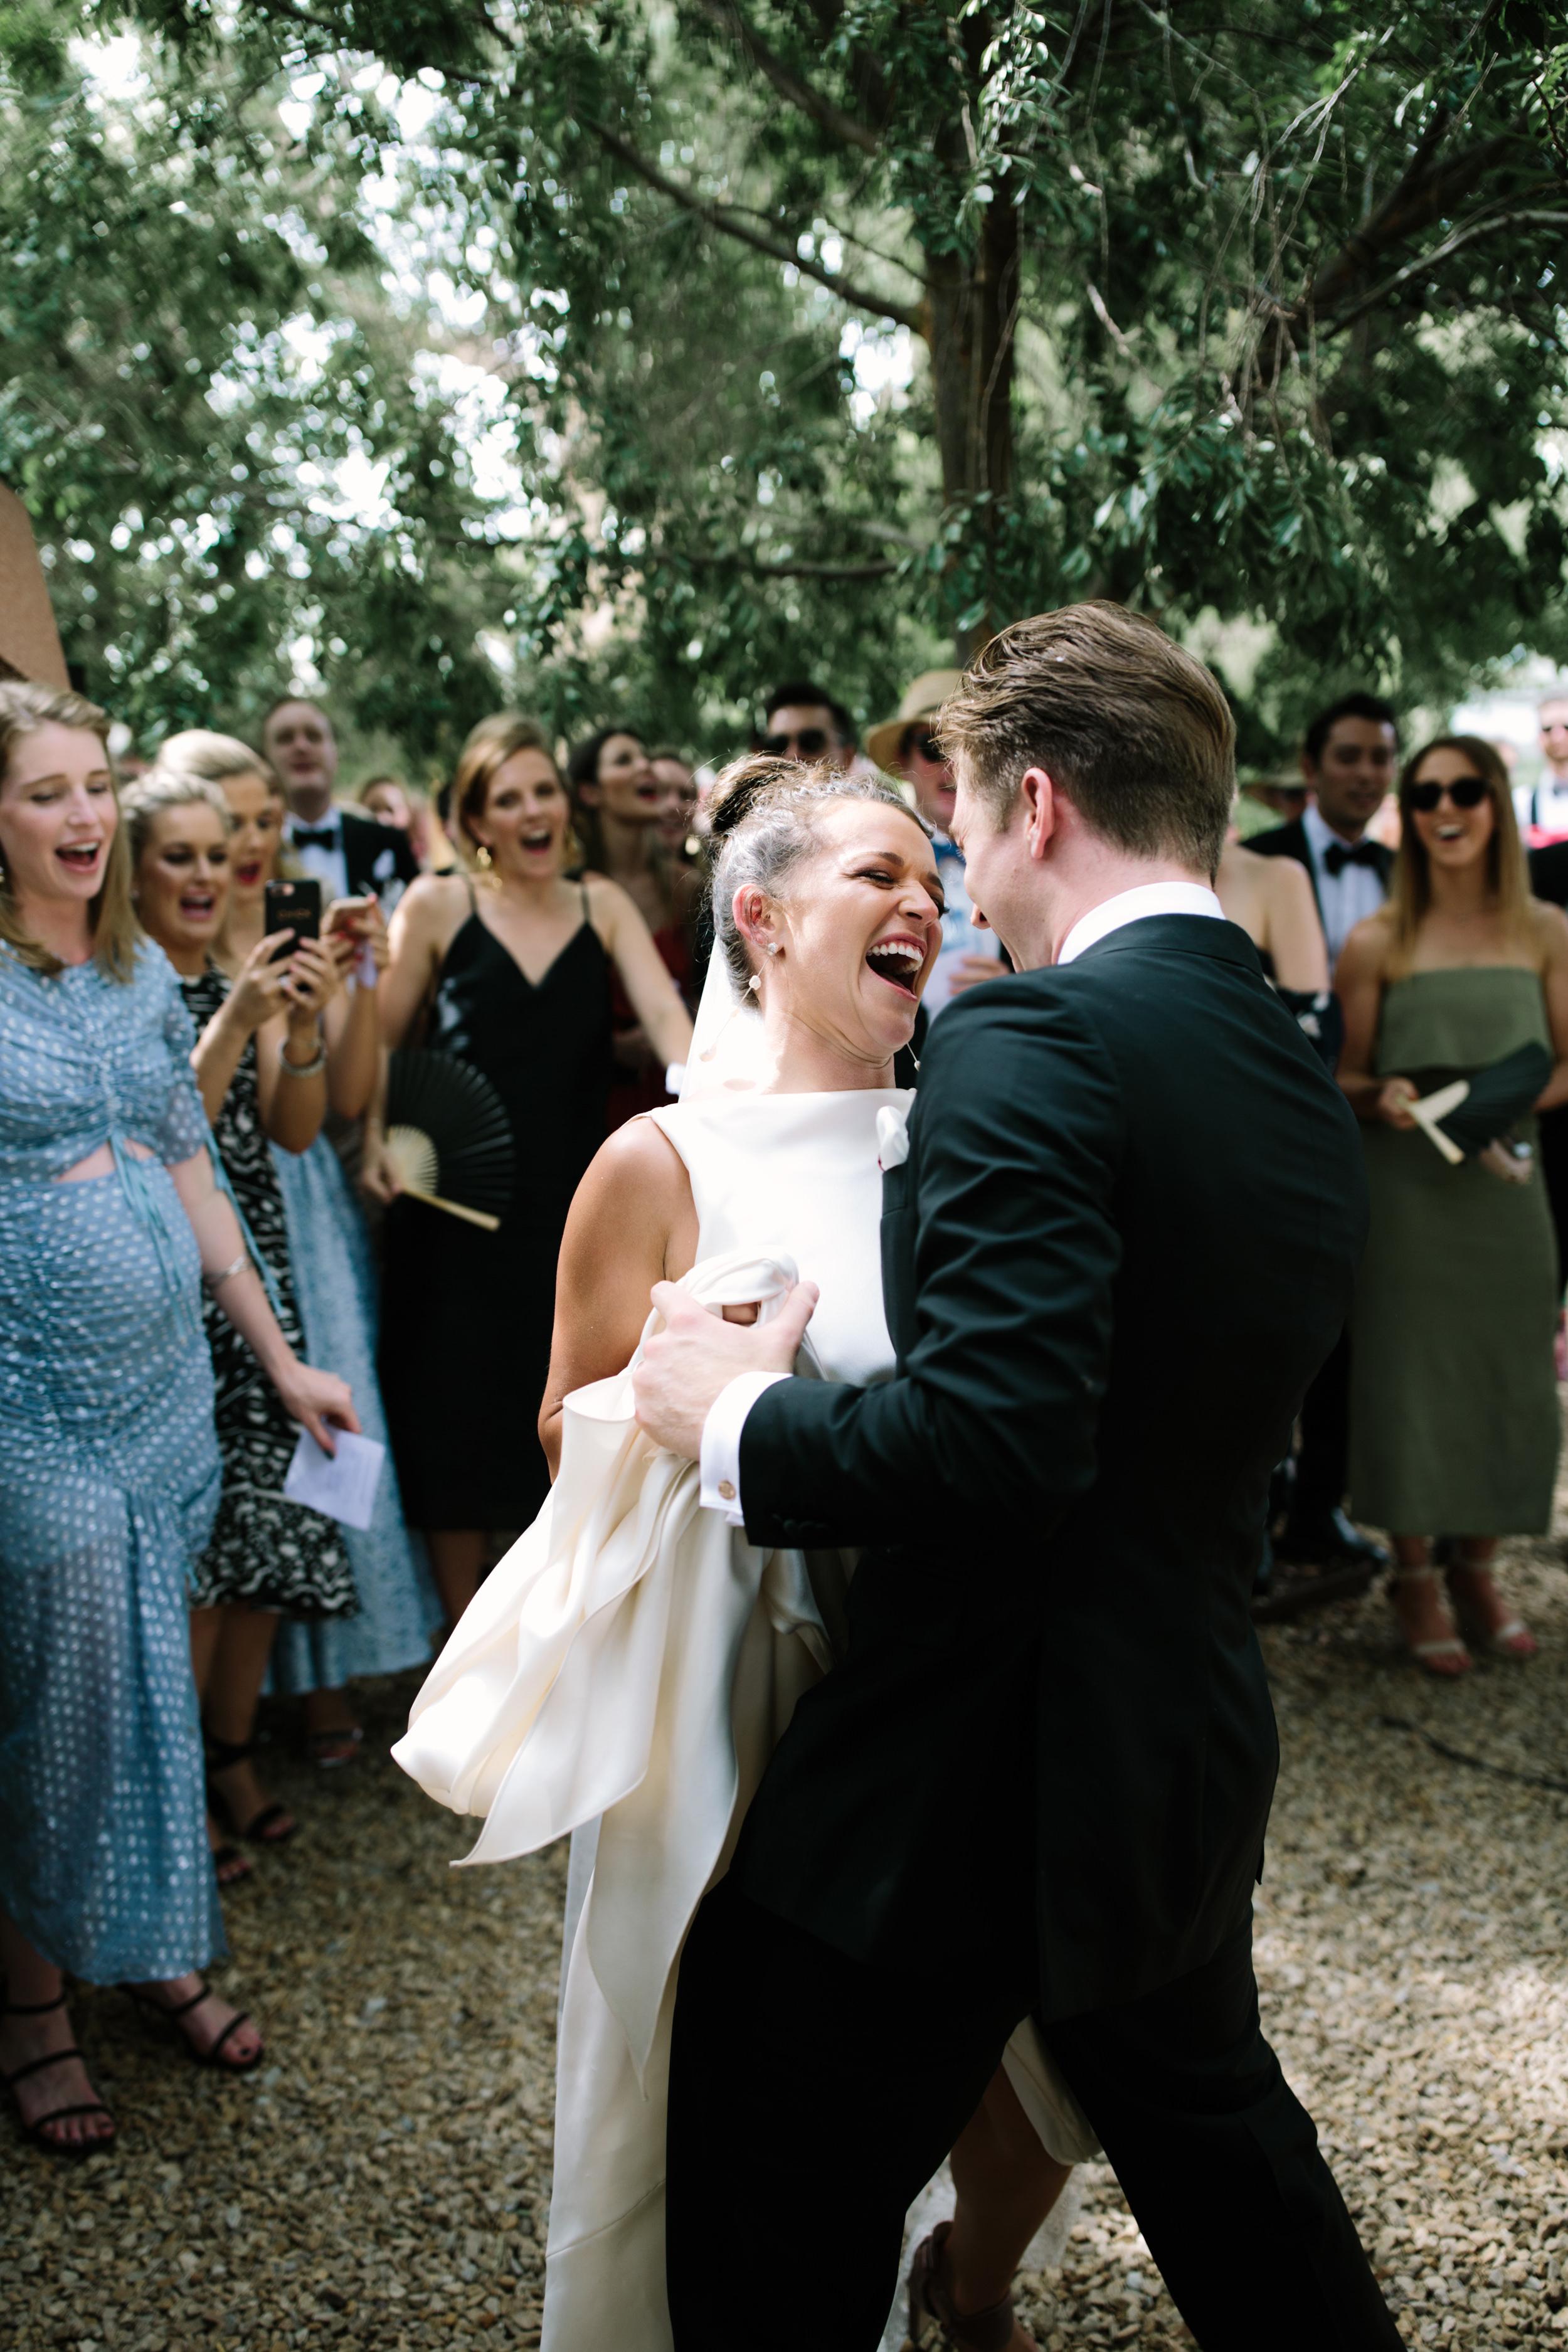 I-Got-You-Babe-Weddings-Vic-Siggy-Barossa-Valley0107.JPG